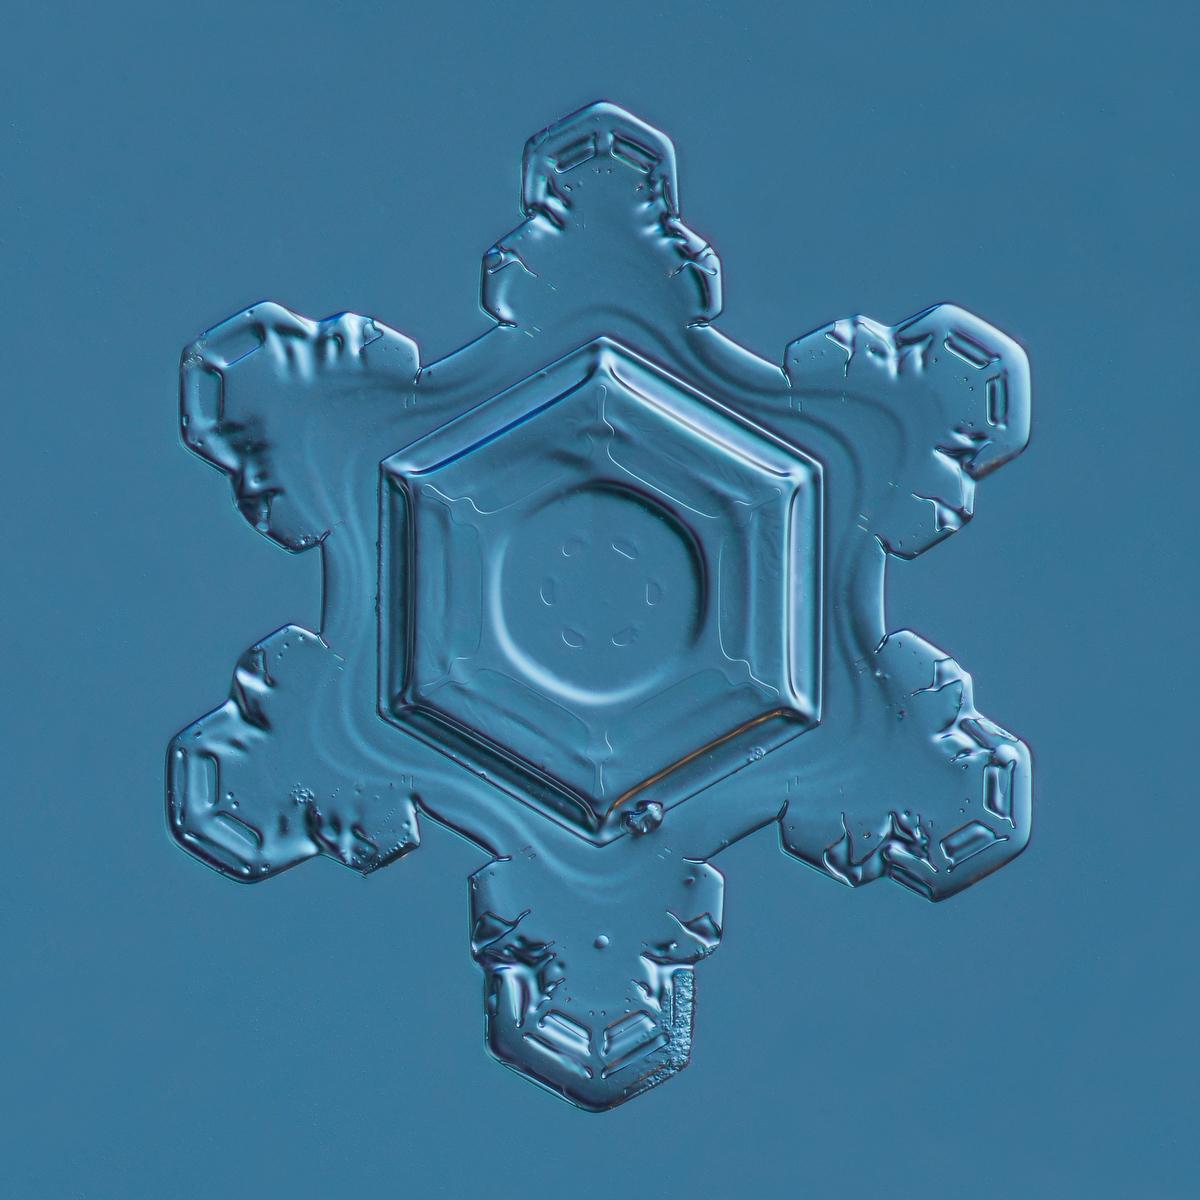 Snowflake 2015.02.25.003